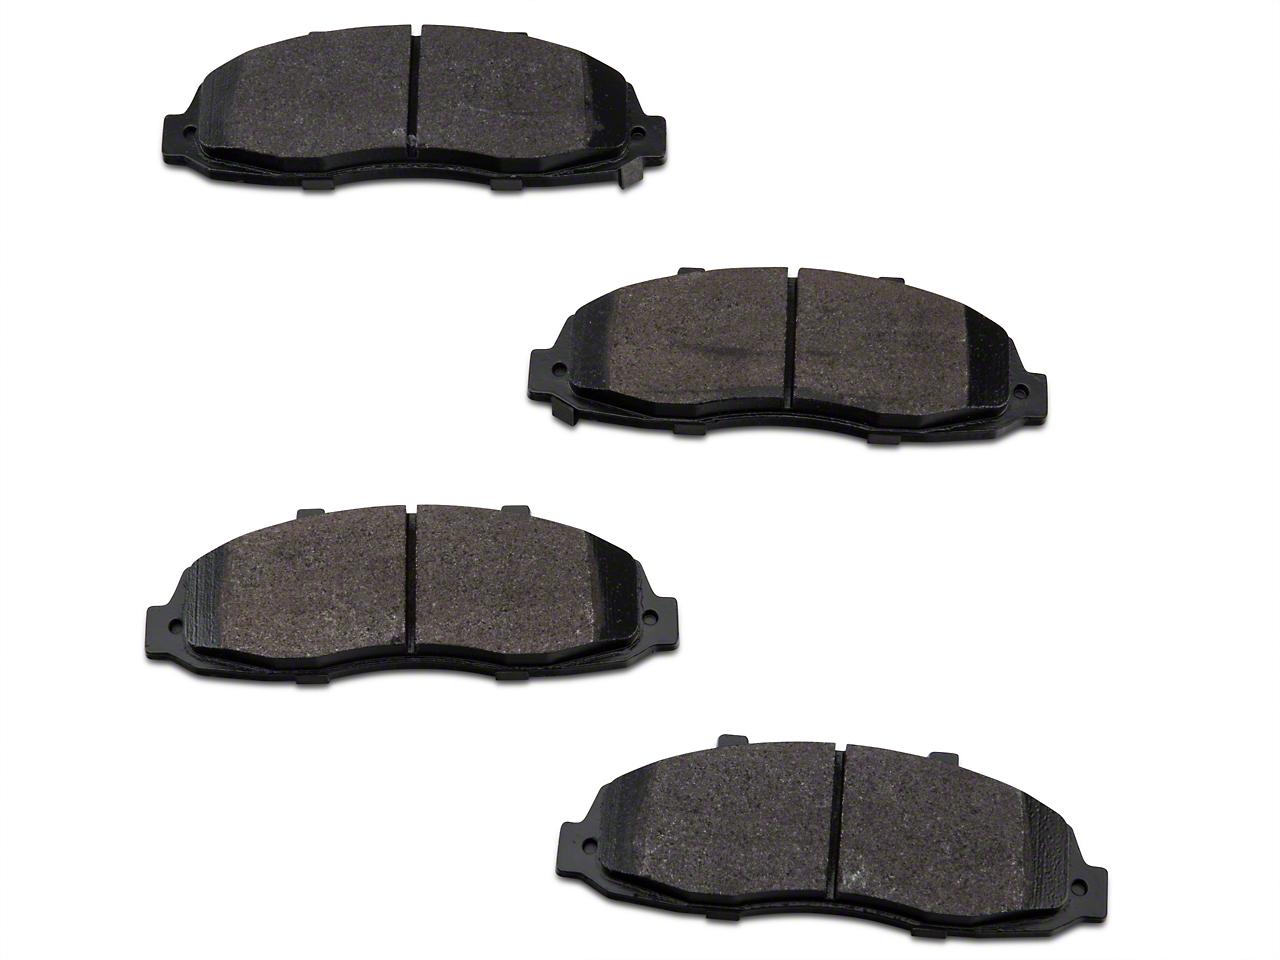 Hawk Performance Ceramic Brake Pads - Front (97-03, 7-Lug)